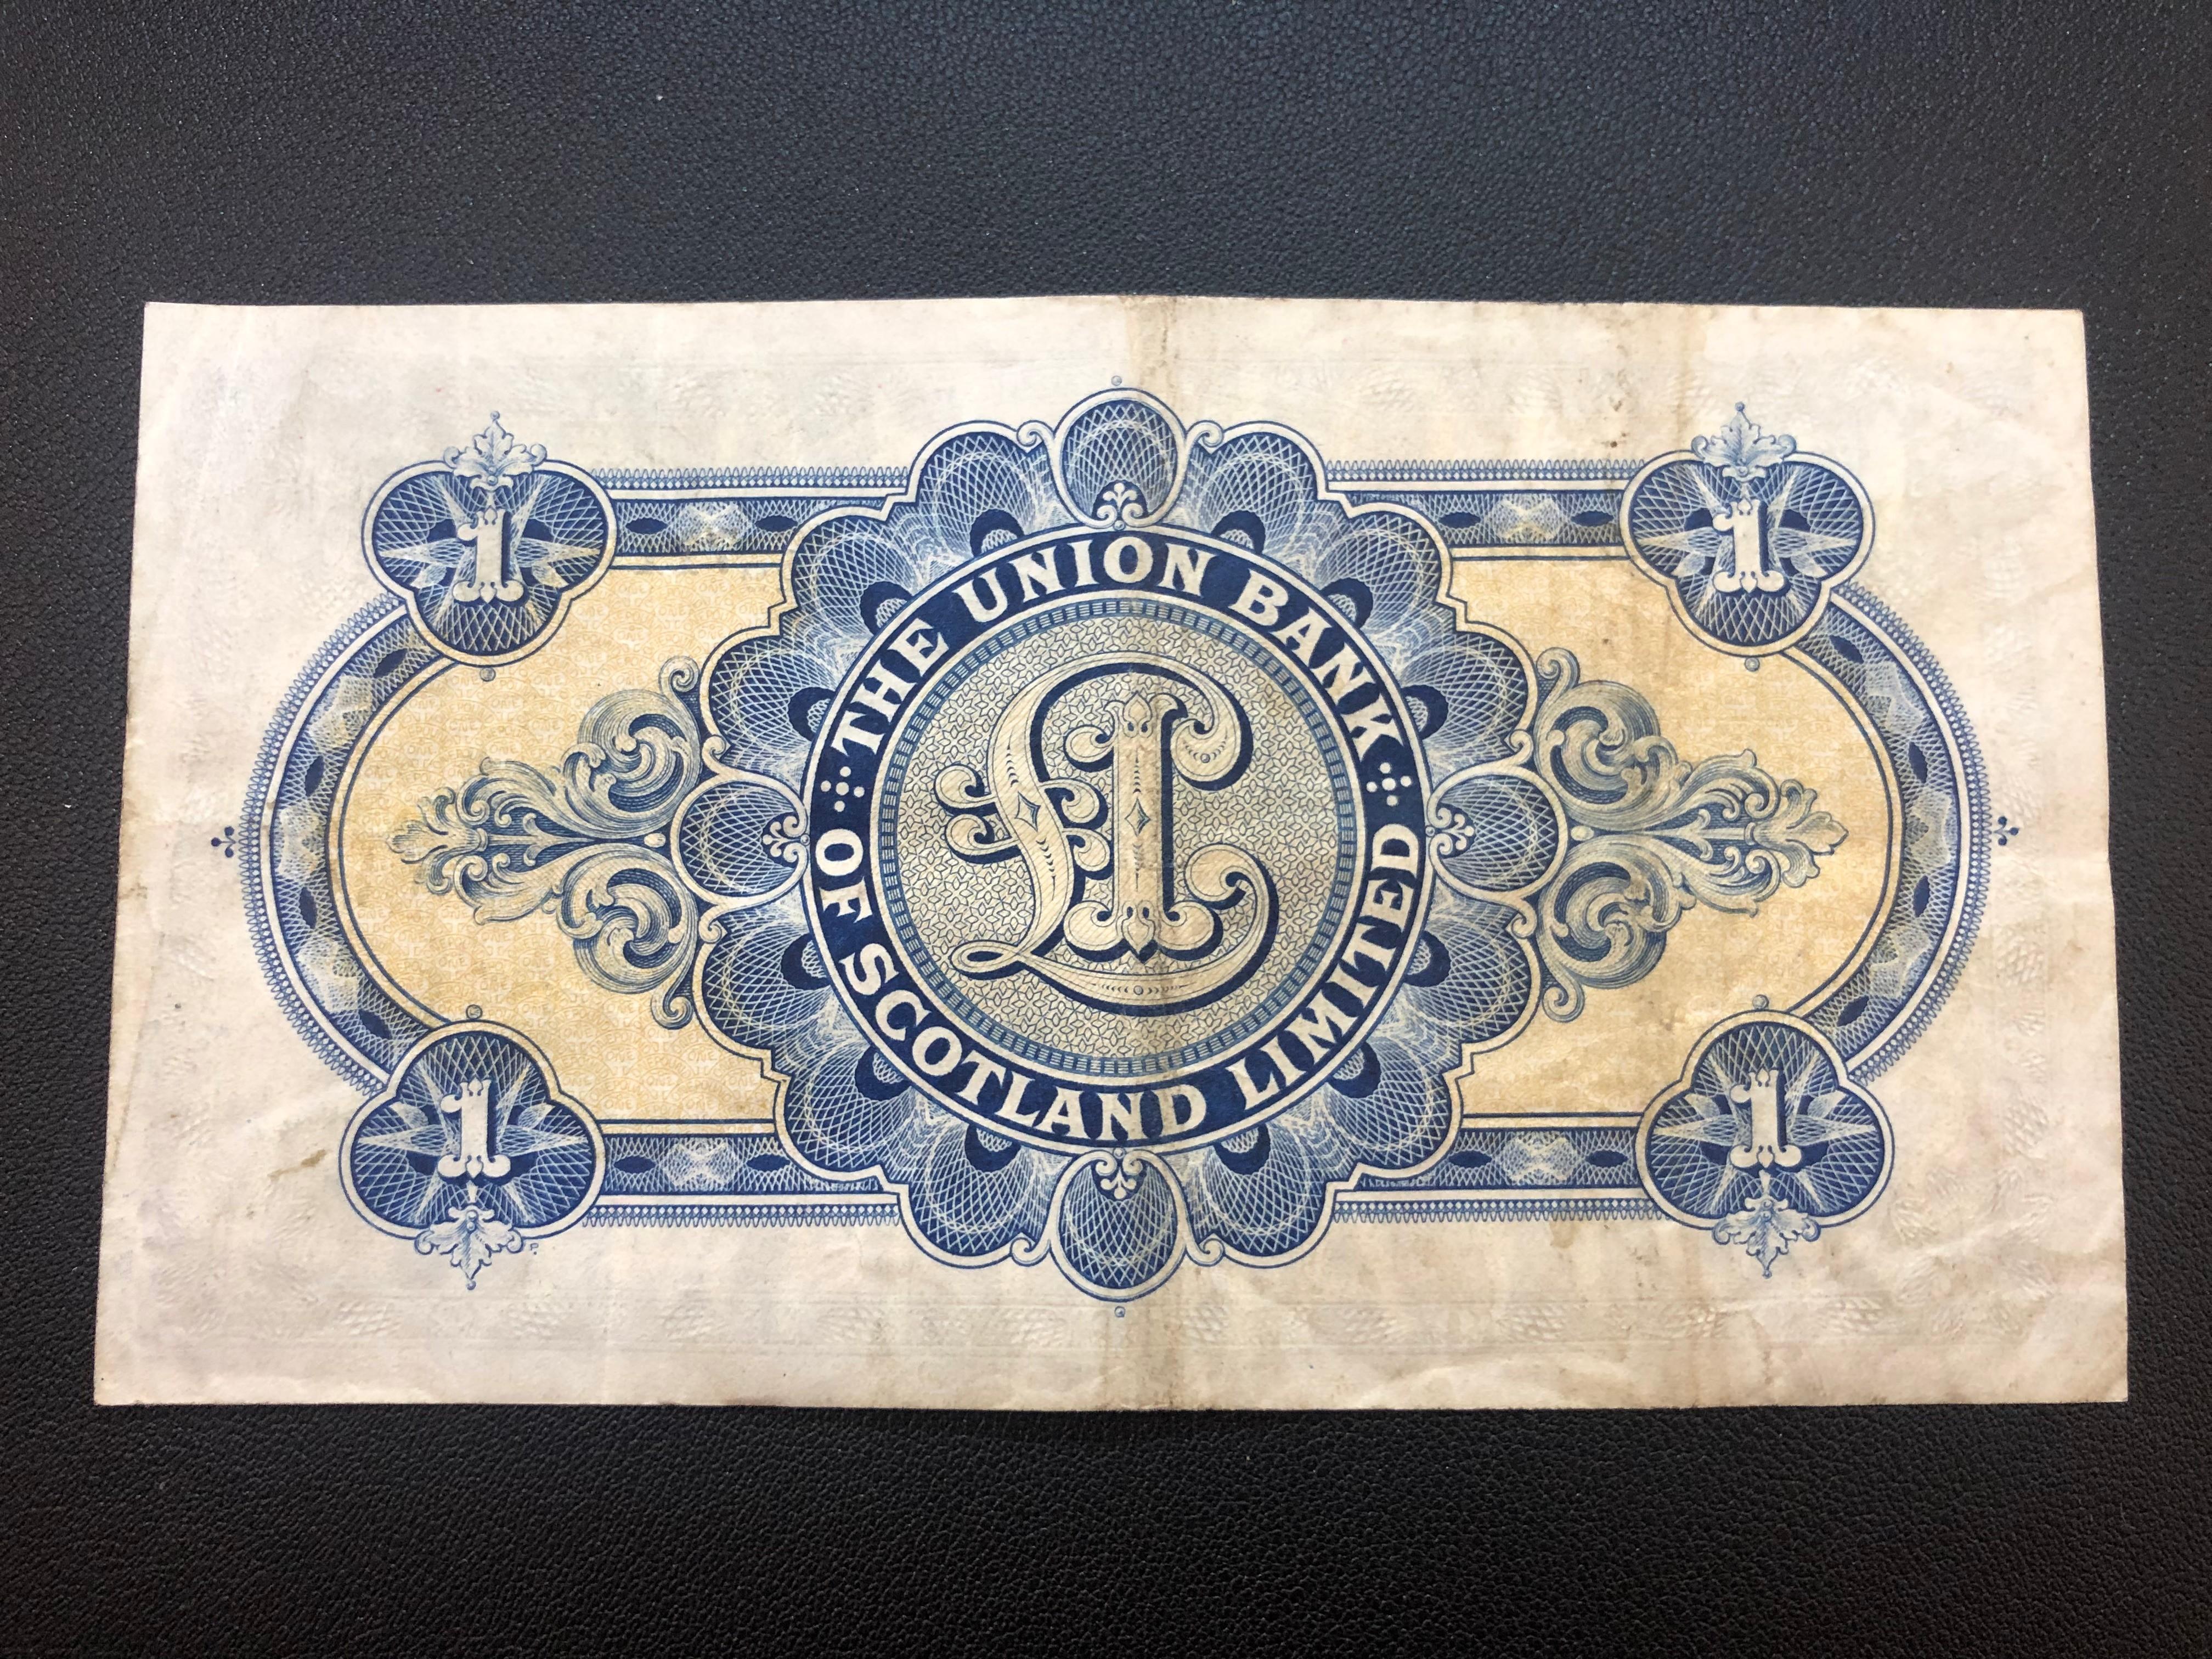 Scotland 1 Pound 1940 S815c Union Bank of Scotland 2.jpg